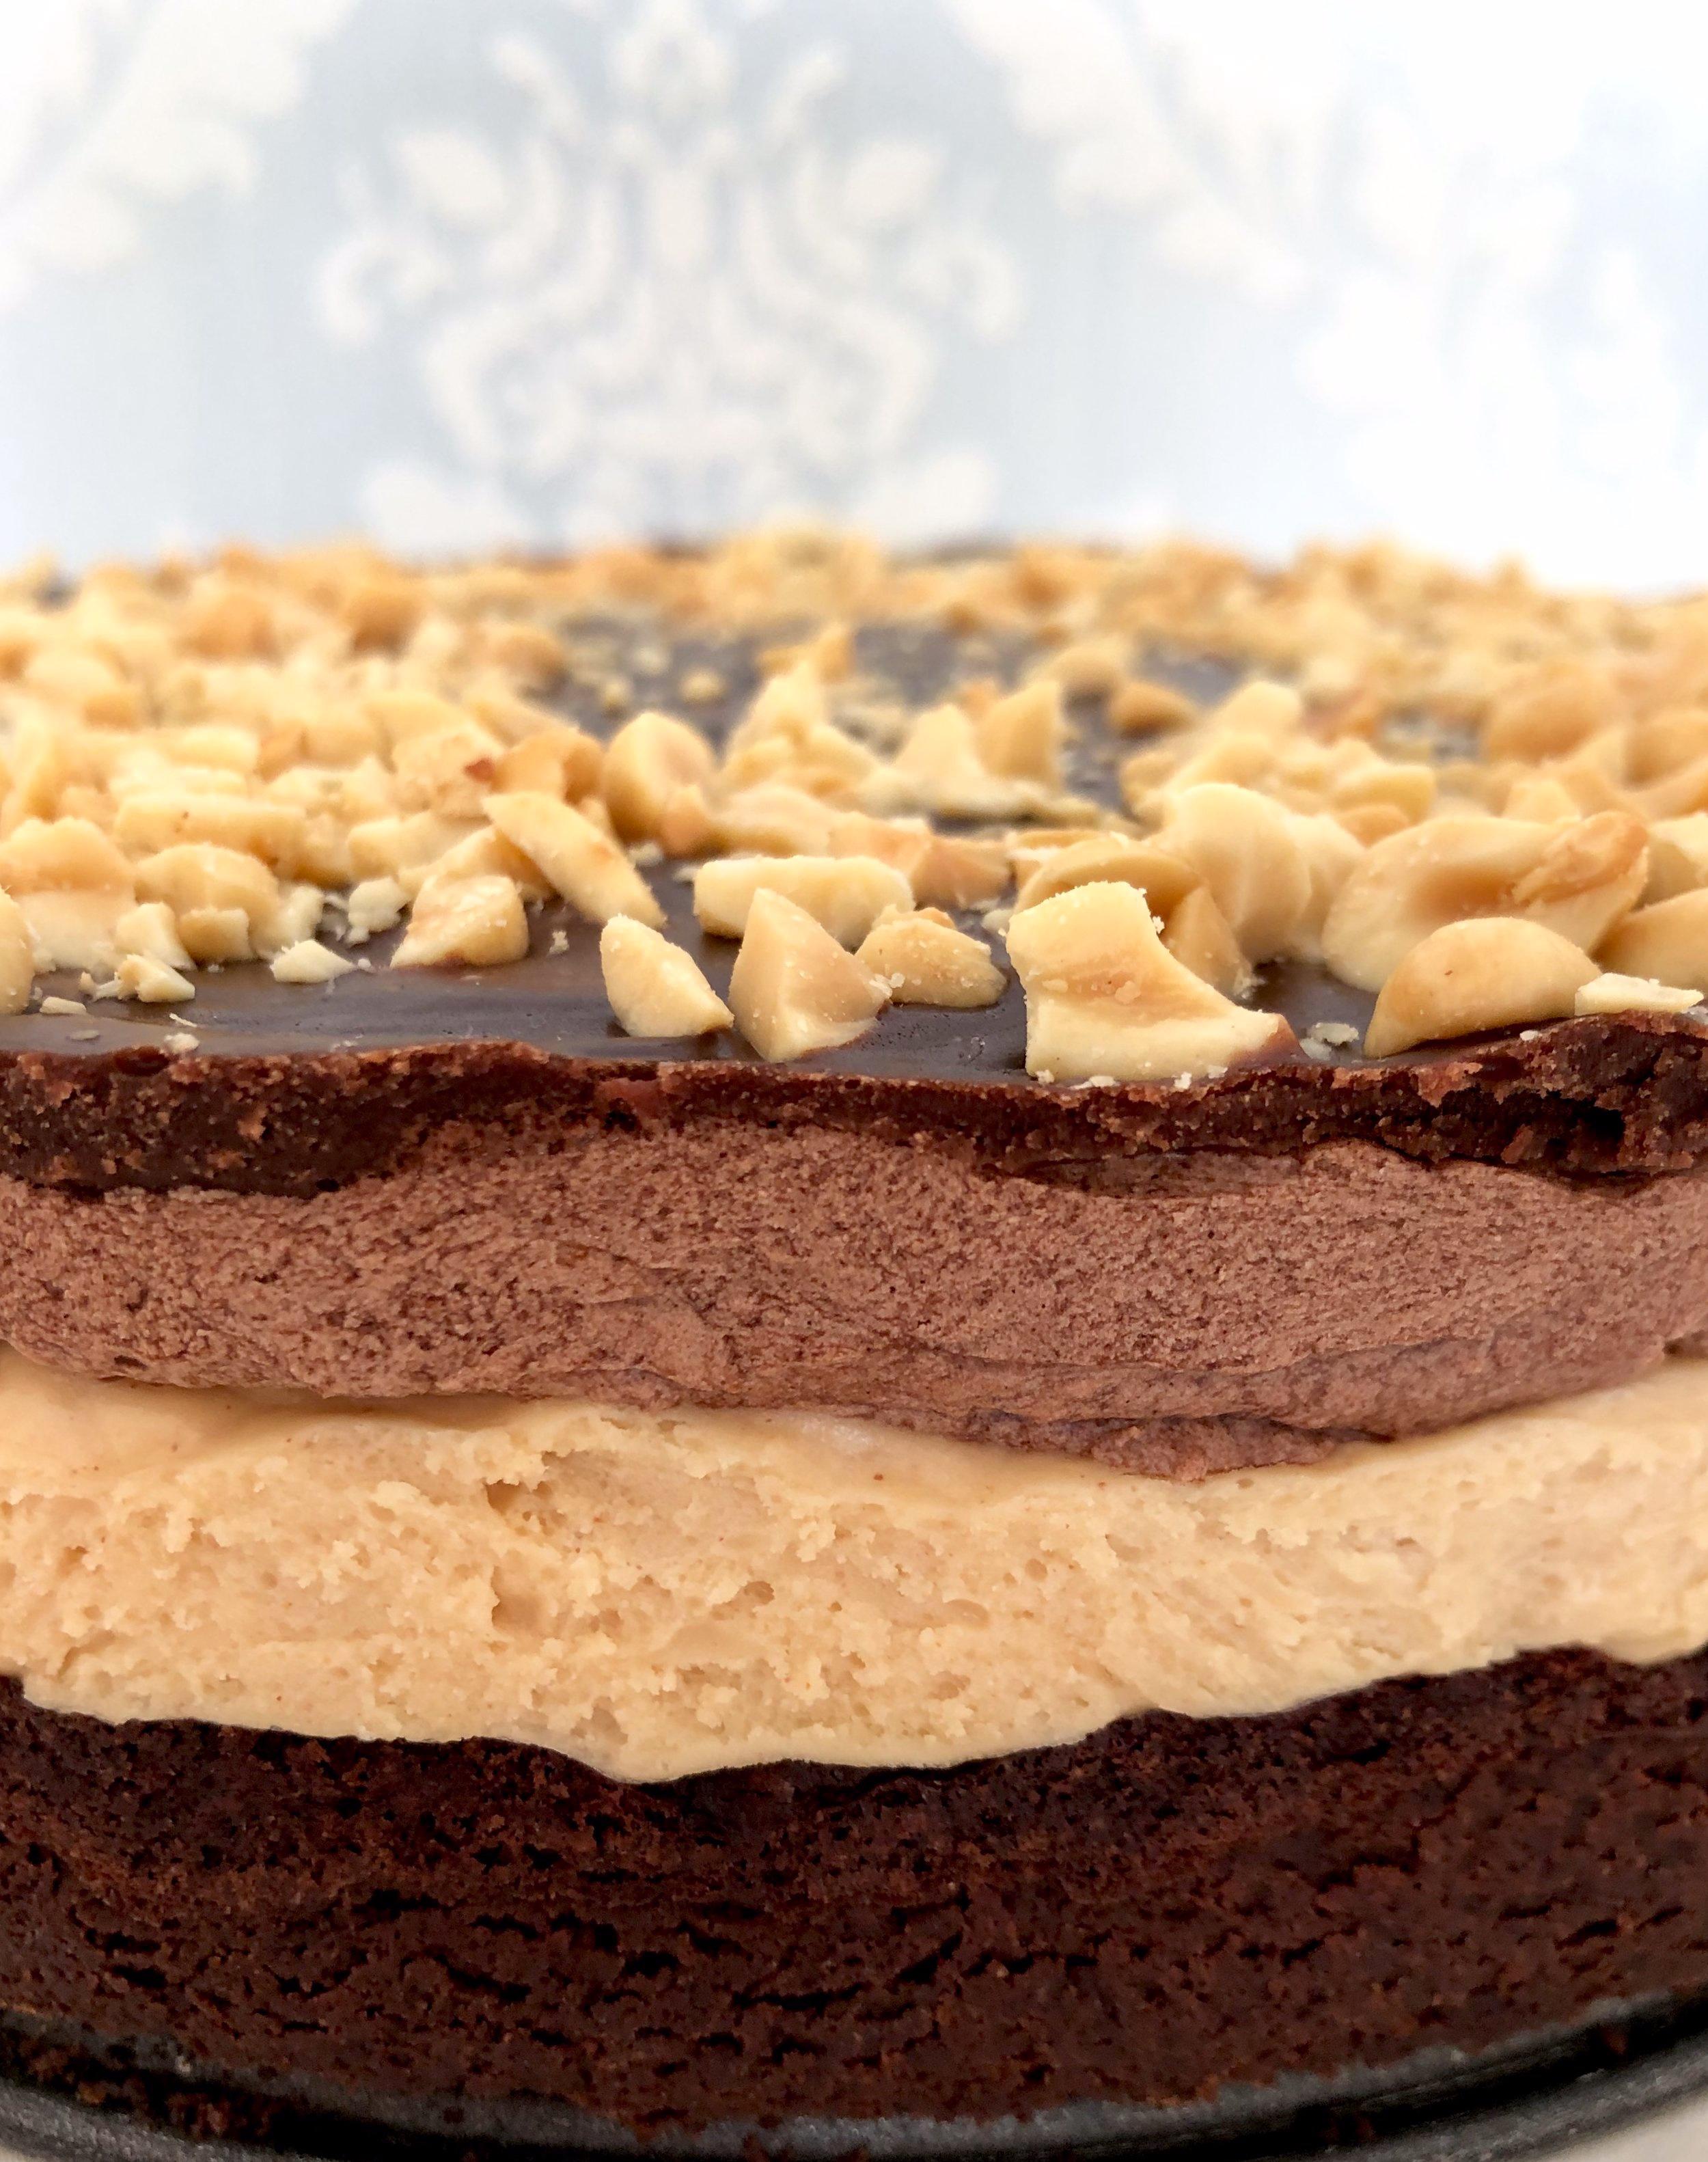 beneath+the+crust%3A+chocolate+peanut+butter+pie